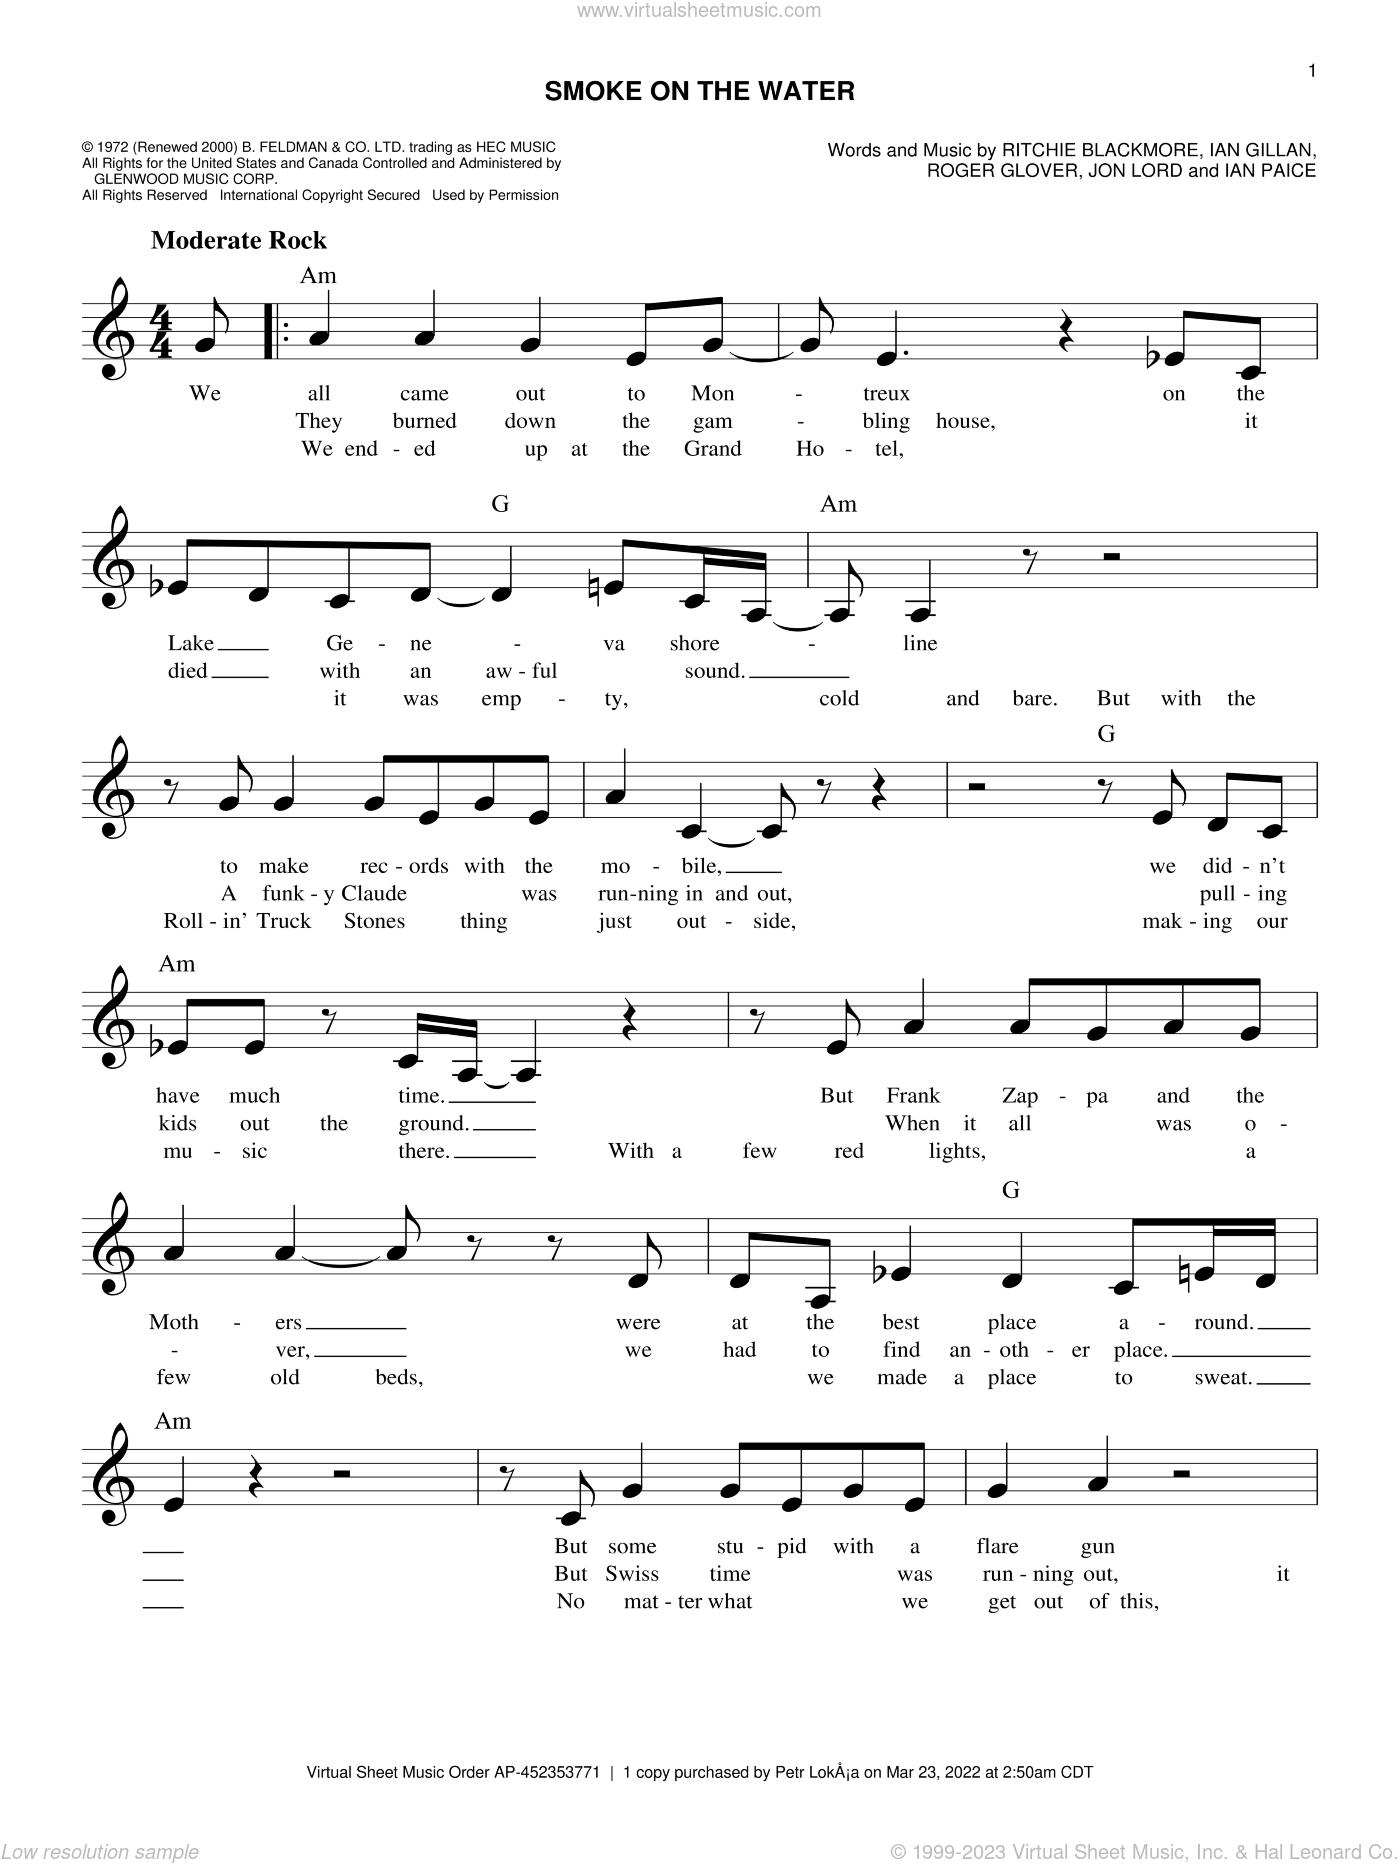 Smoke on the water music sheet pdf